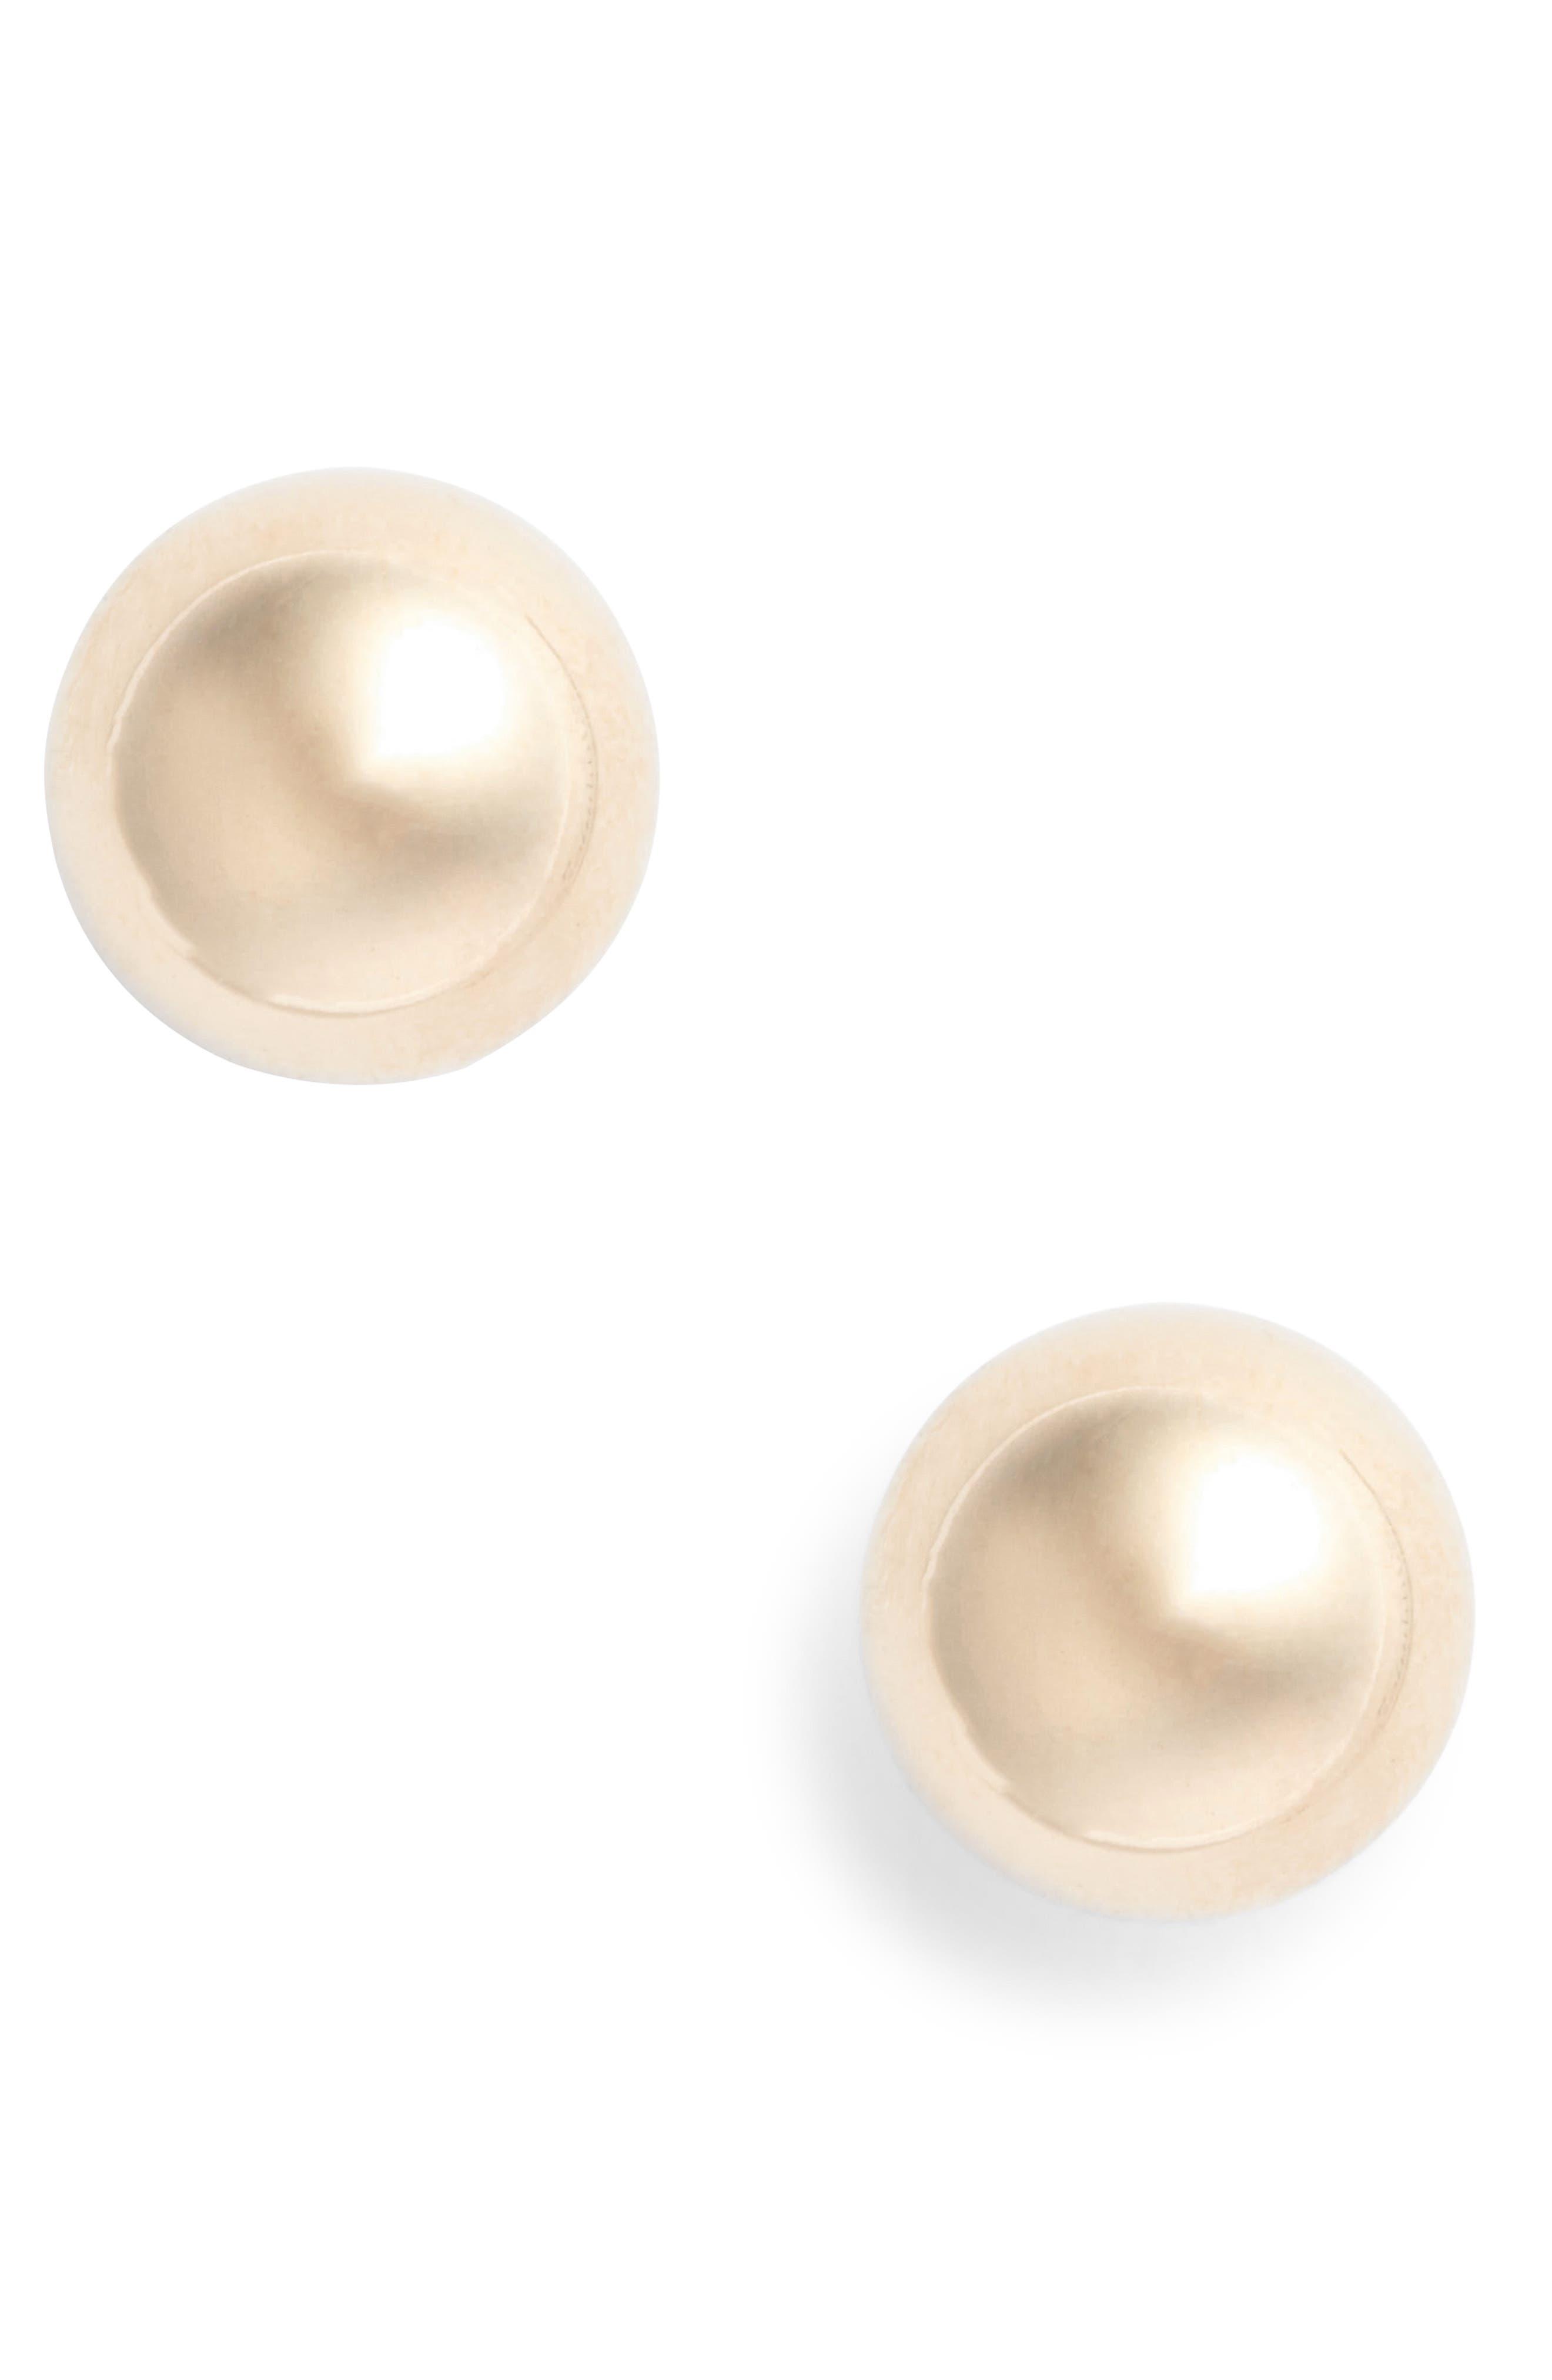 14K Ball Stud Earrings,                             Main thumbnail 1, color,                             YELLOW GOLD